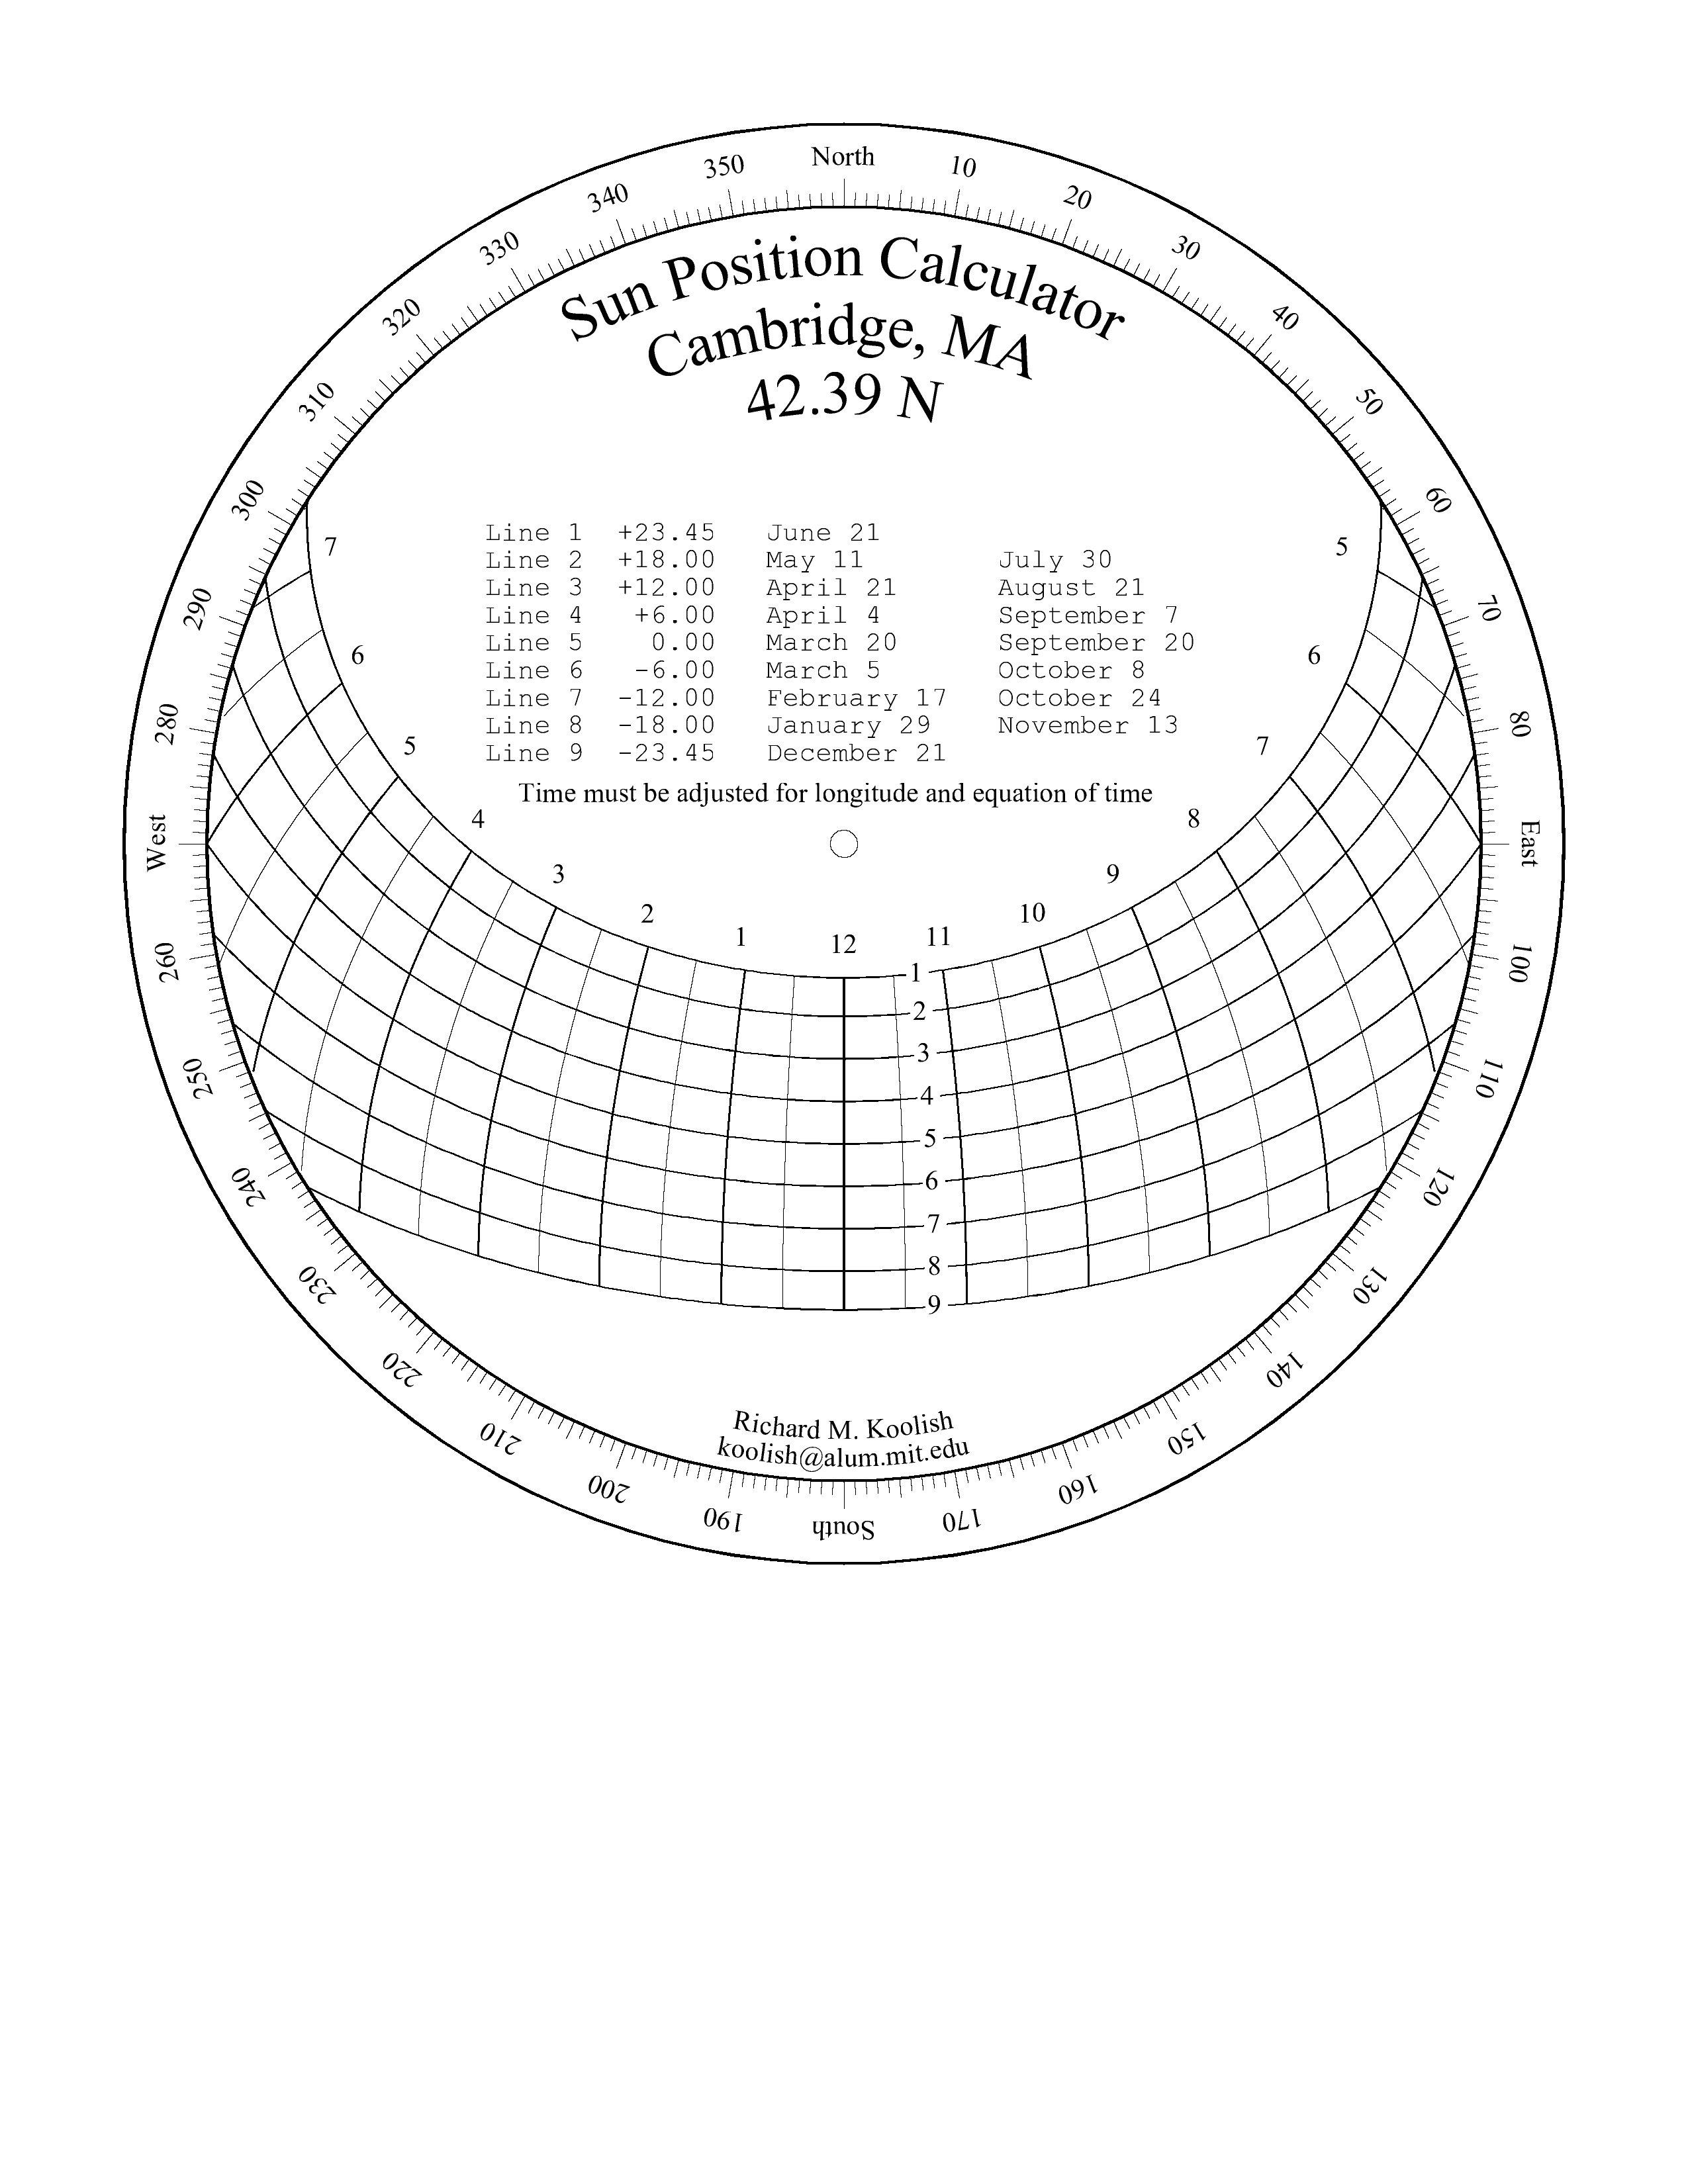 Sun Position Calculator